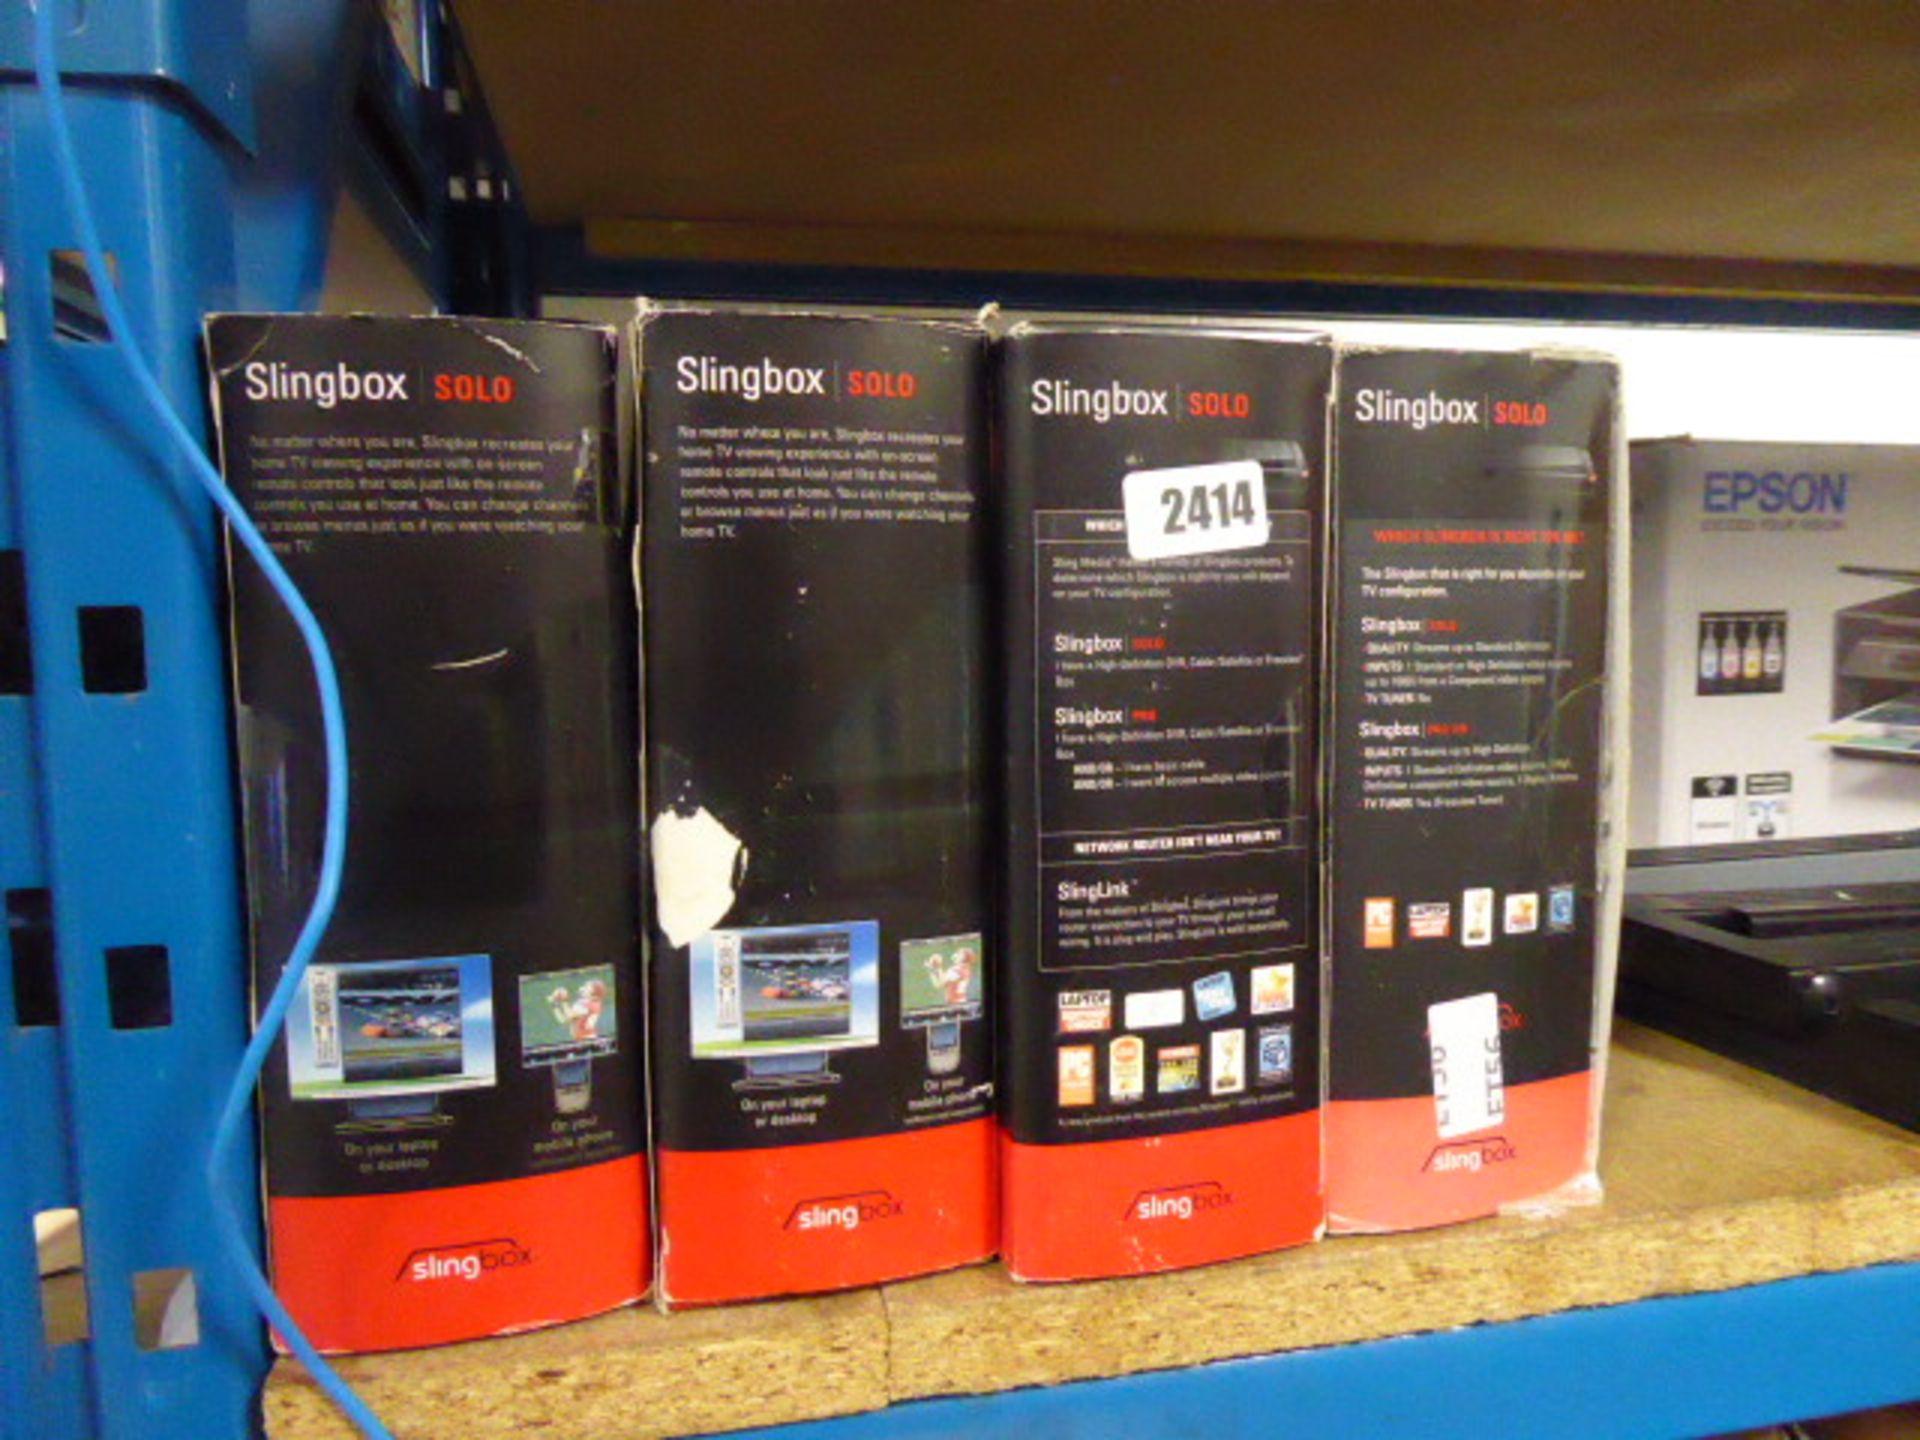 Lot 2414 - 4 boxed Slingbox solo units